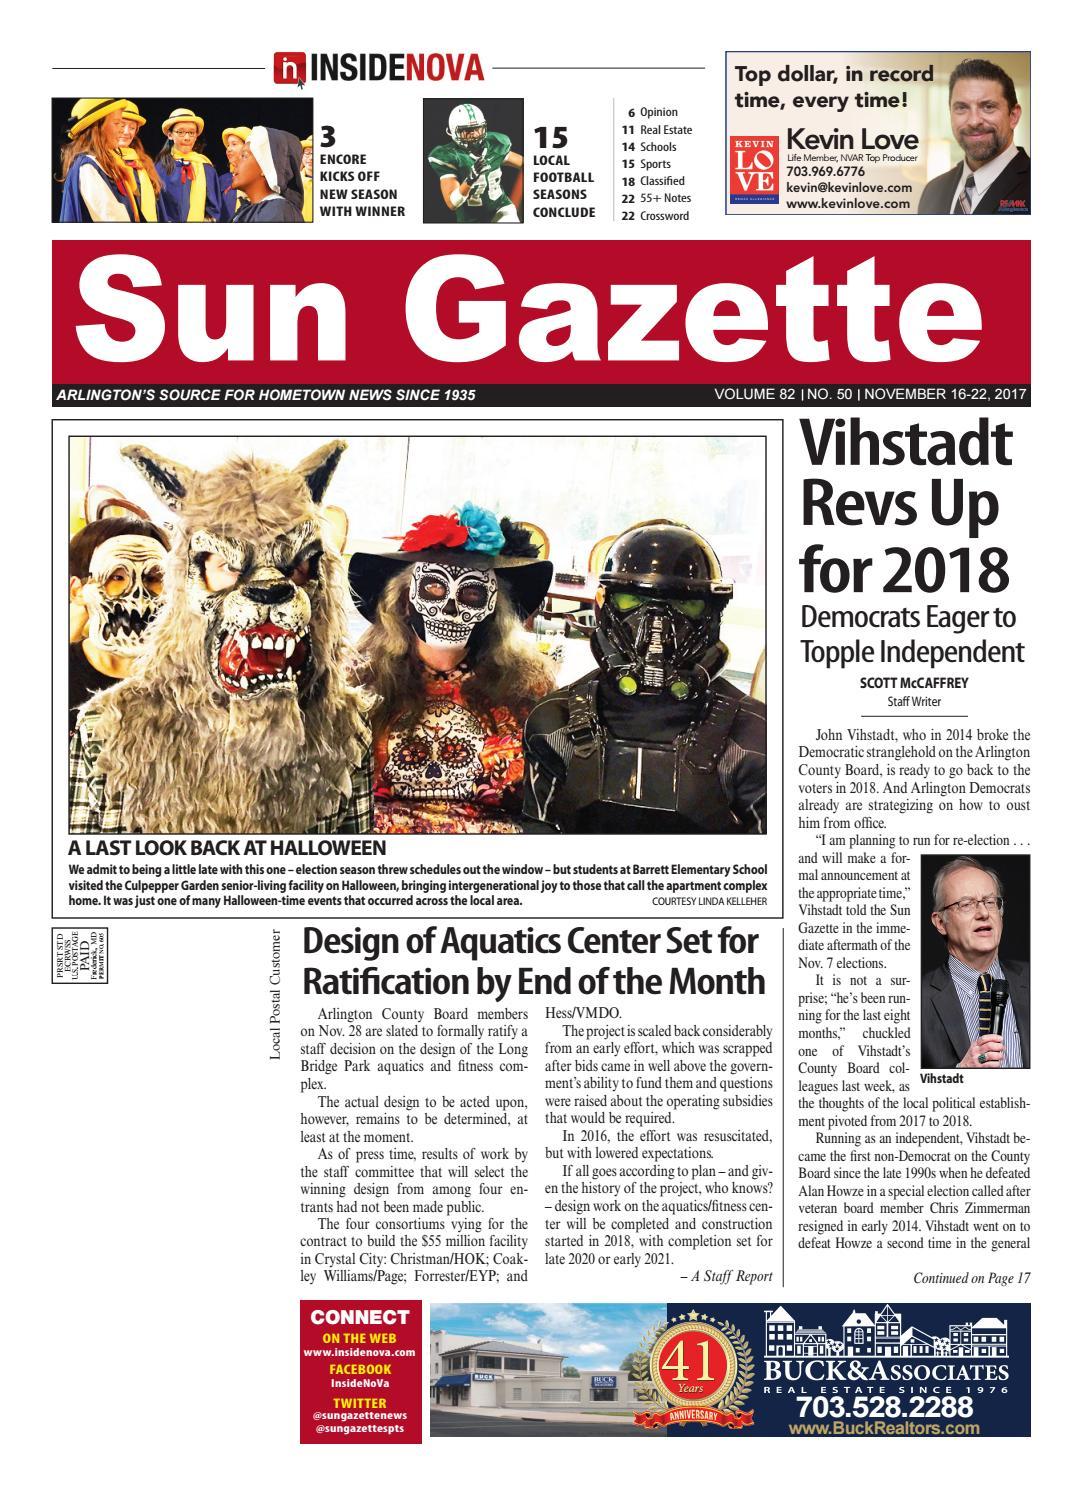 Sun Gazette Arlington November 16 2017 By Insidenova Issuu